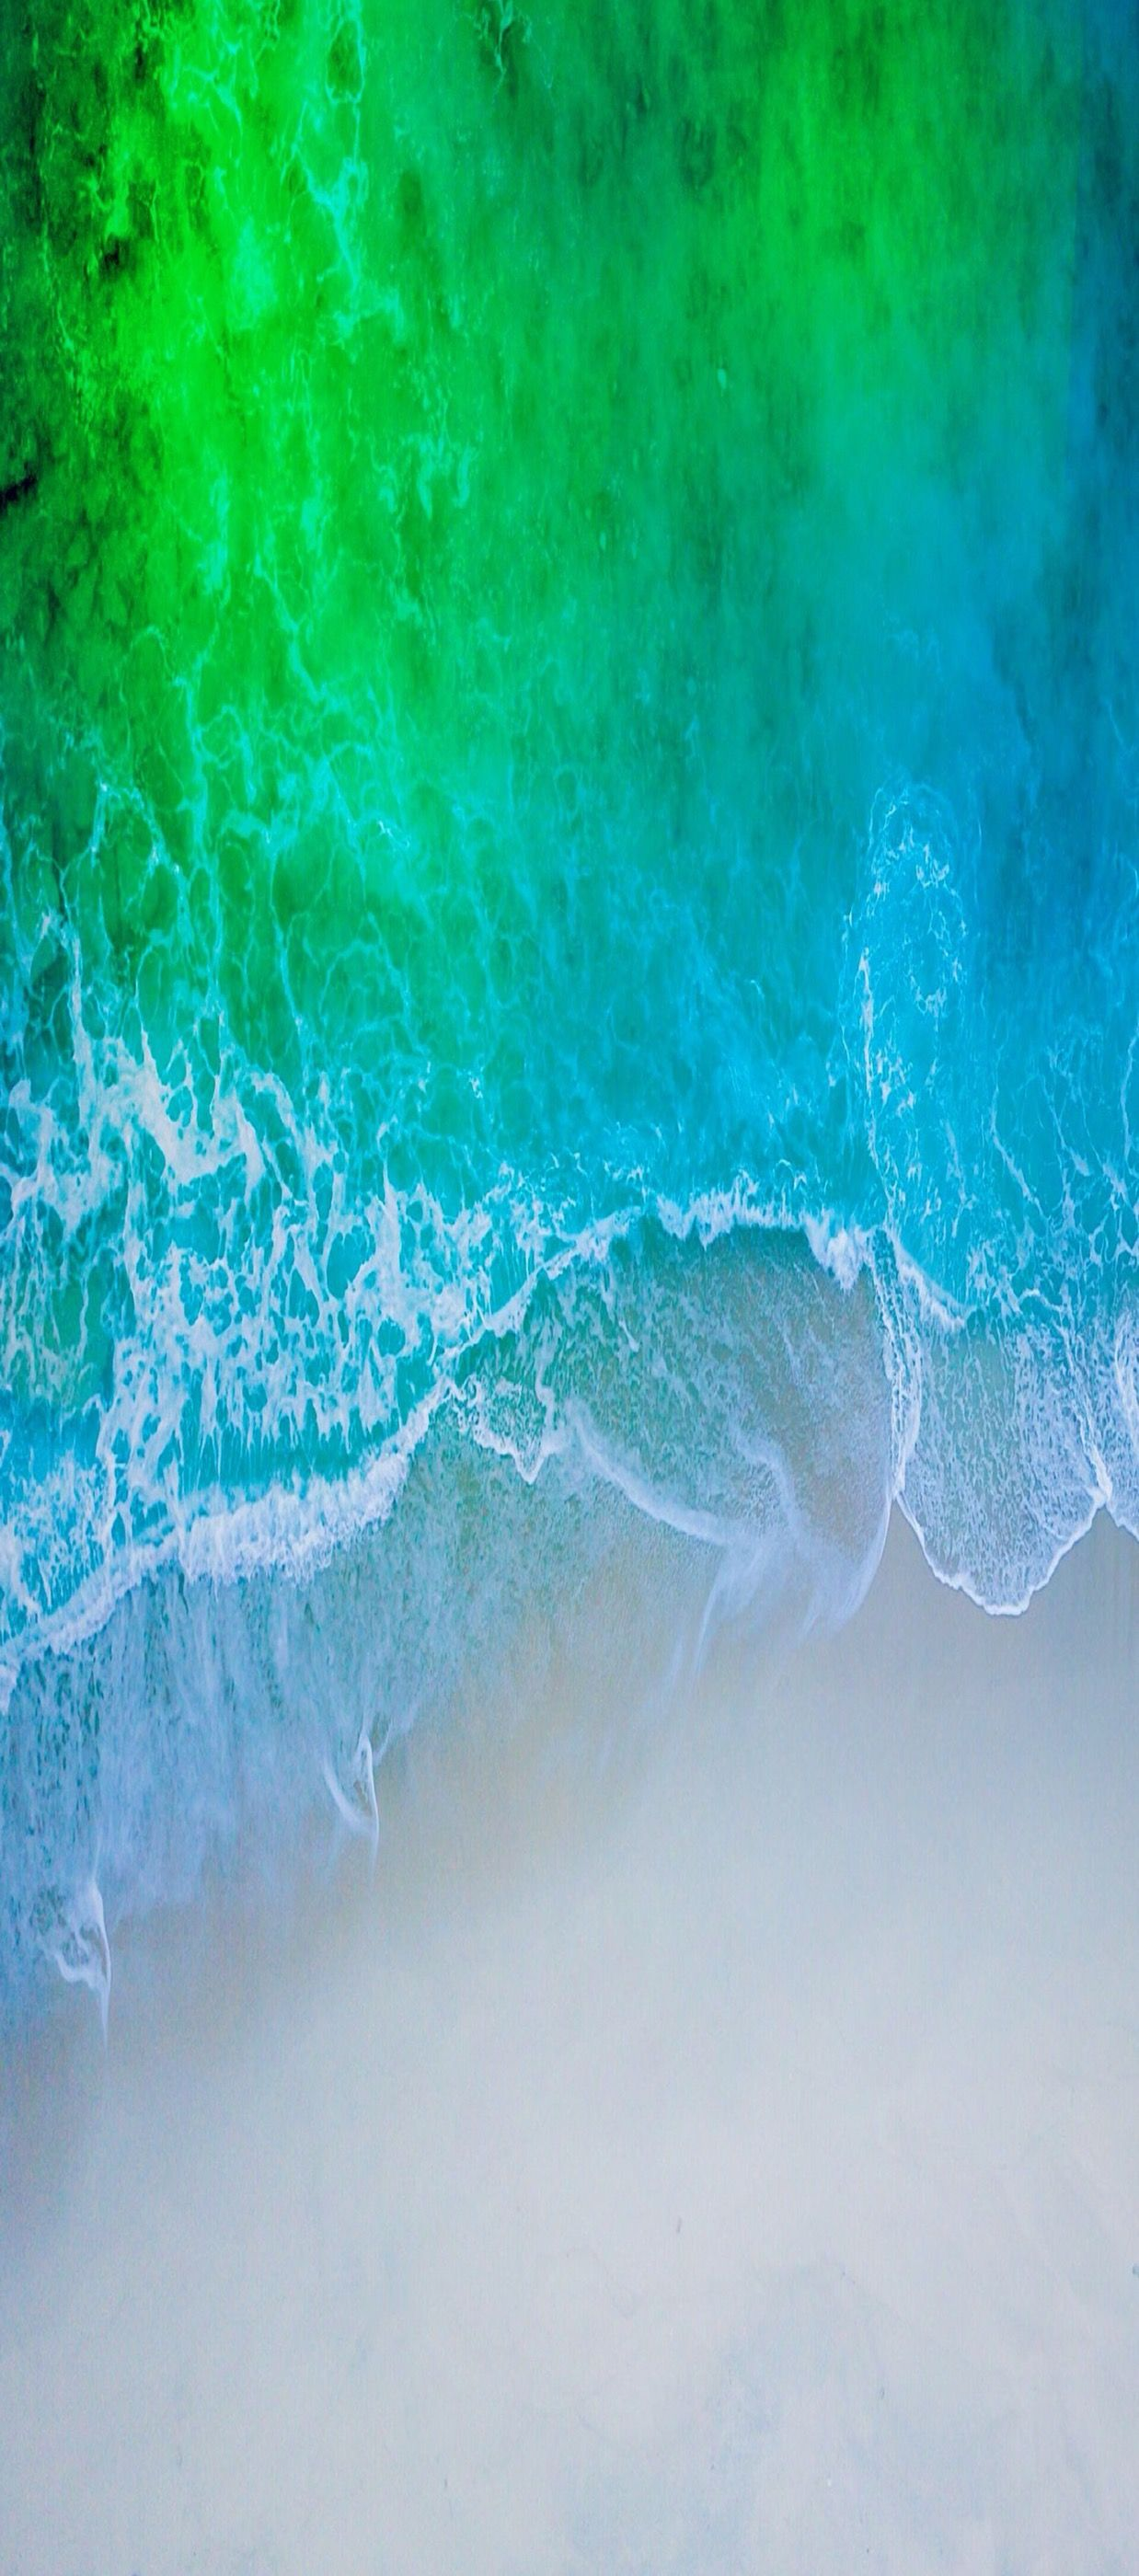 Ios 11 Iphone X Aqua Blue Water Beach Wave Ocean Apple Wallpaper Iphone 8 Clean Beauty Colour Ios Minimal Wallpaper Ponsel Latar Belakang Seni